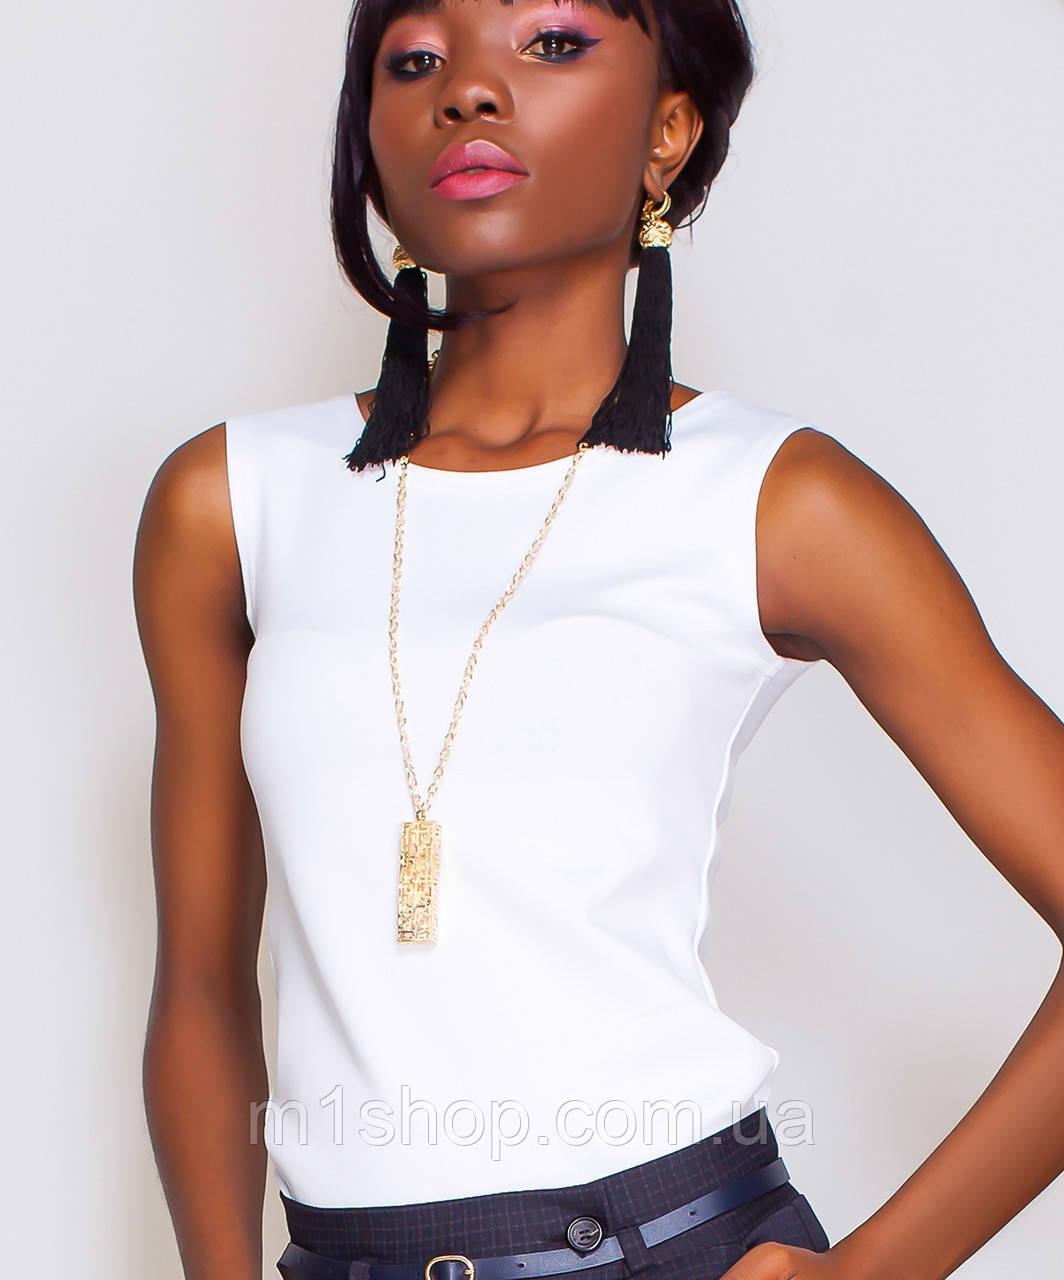 Женская блузка без рукавов (Рокси jd)